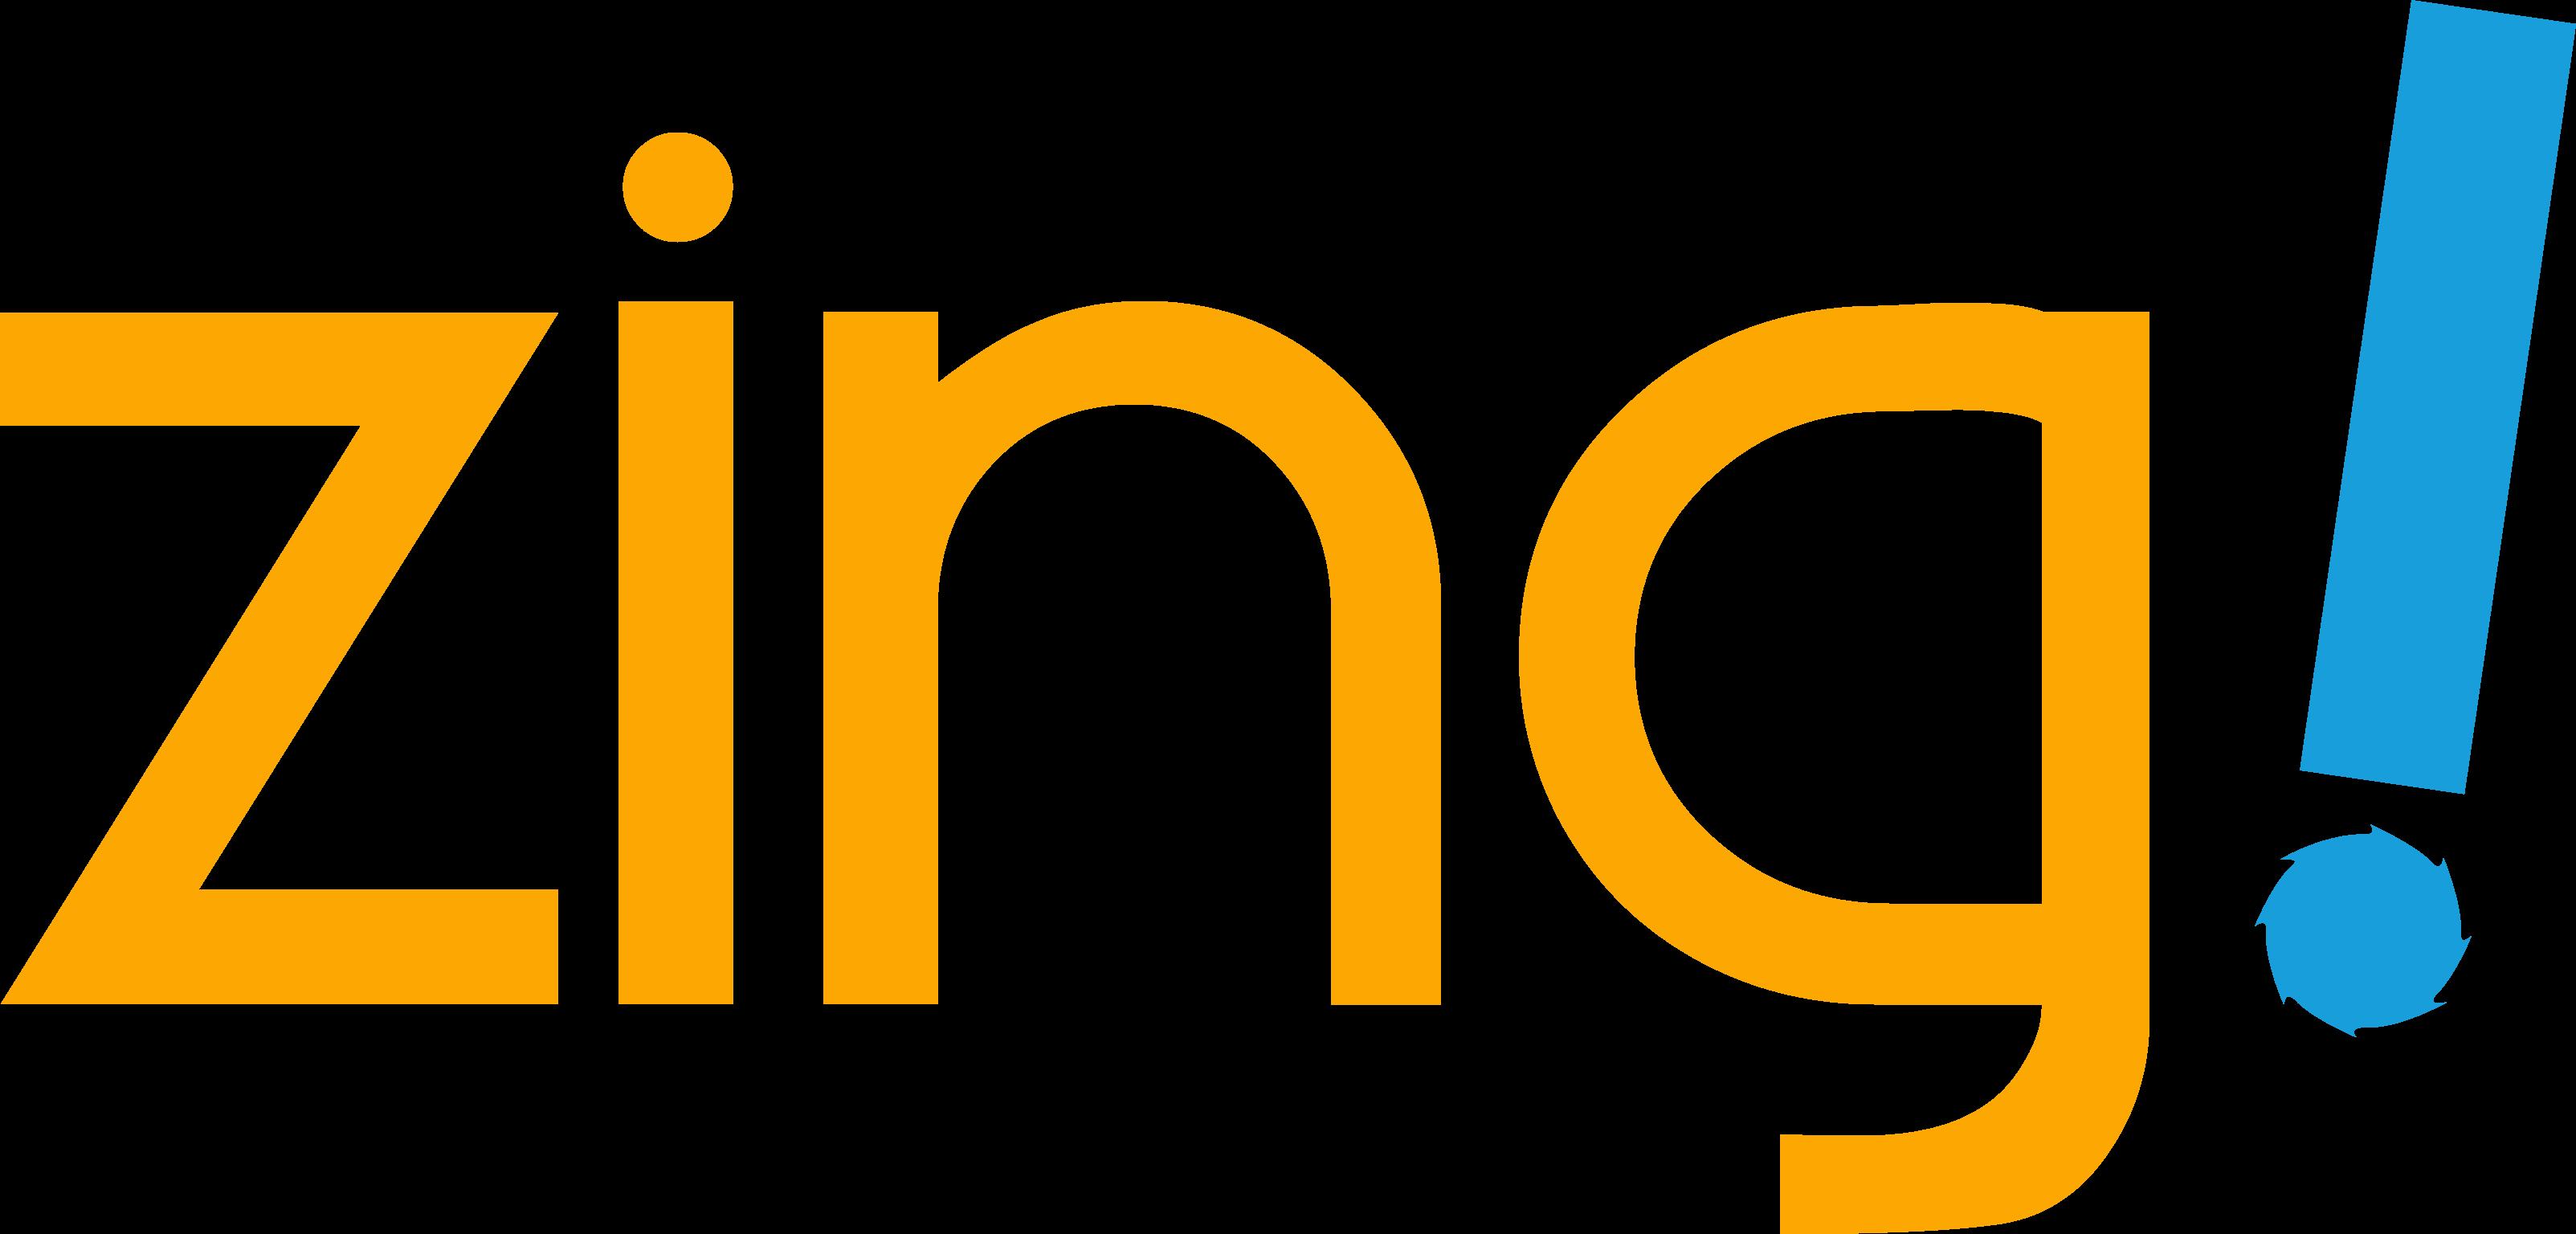 zing_logo (1)